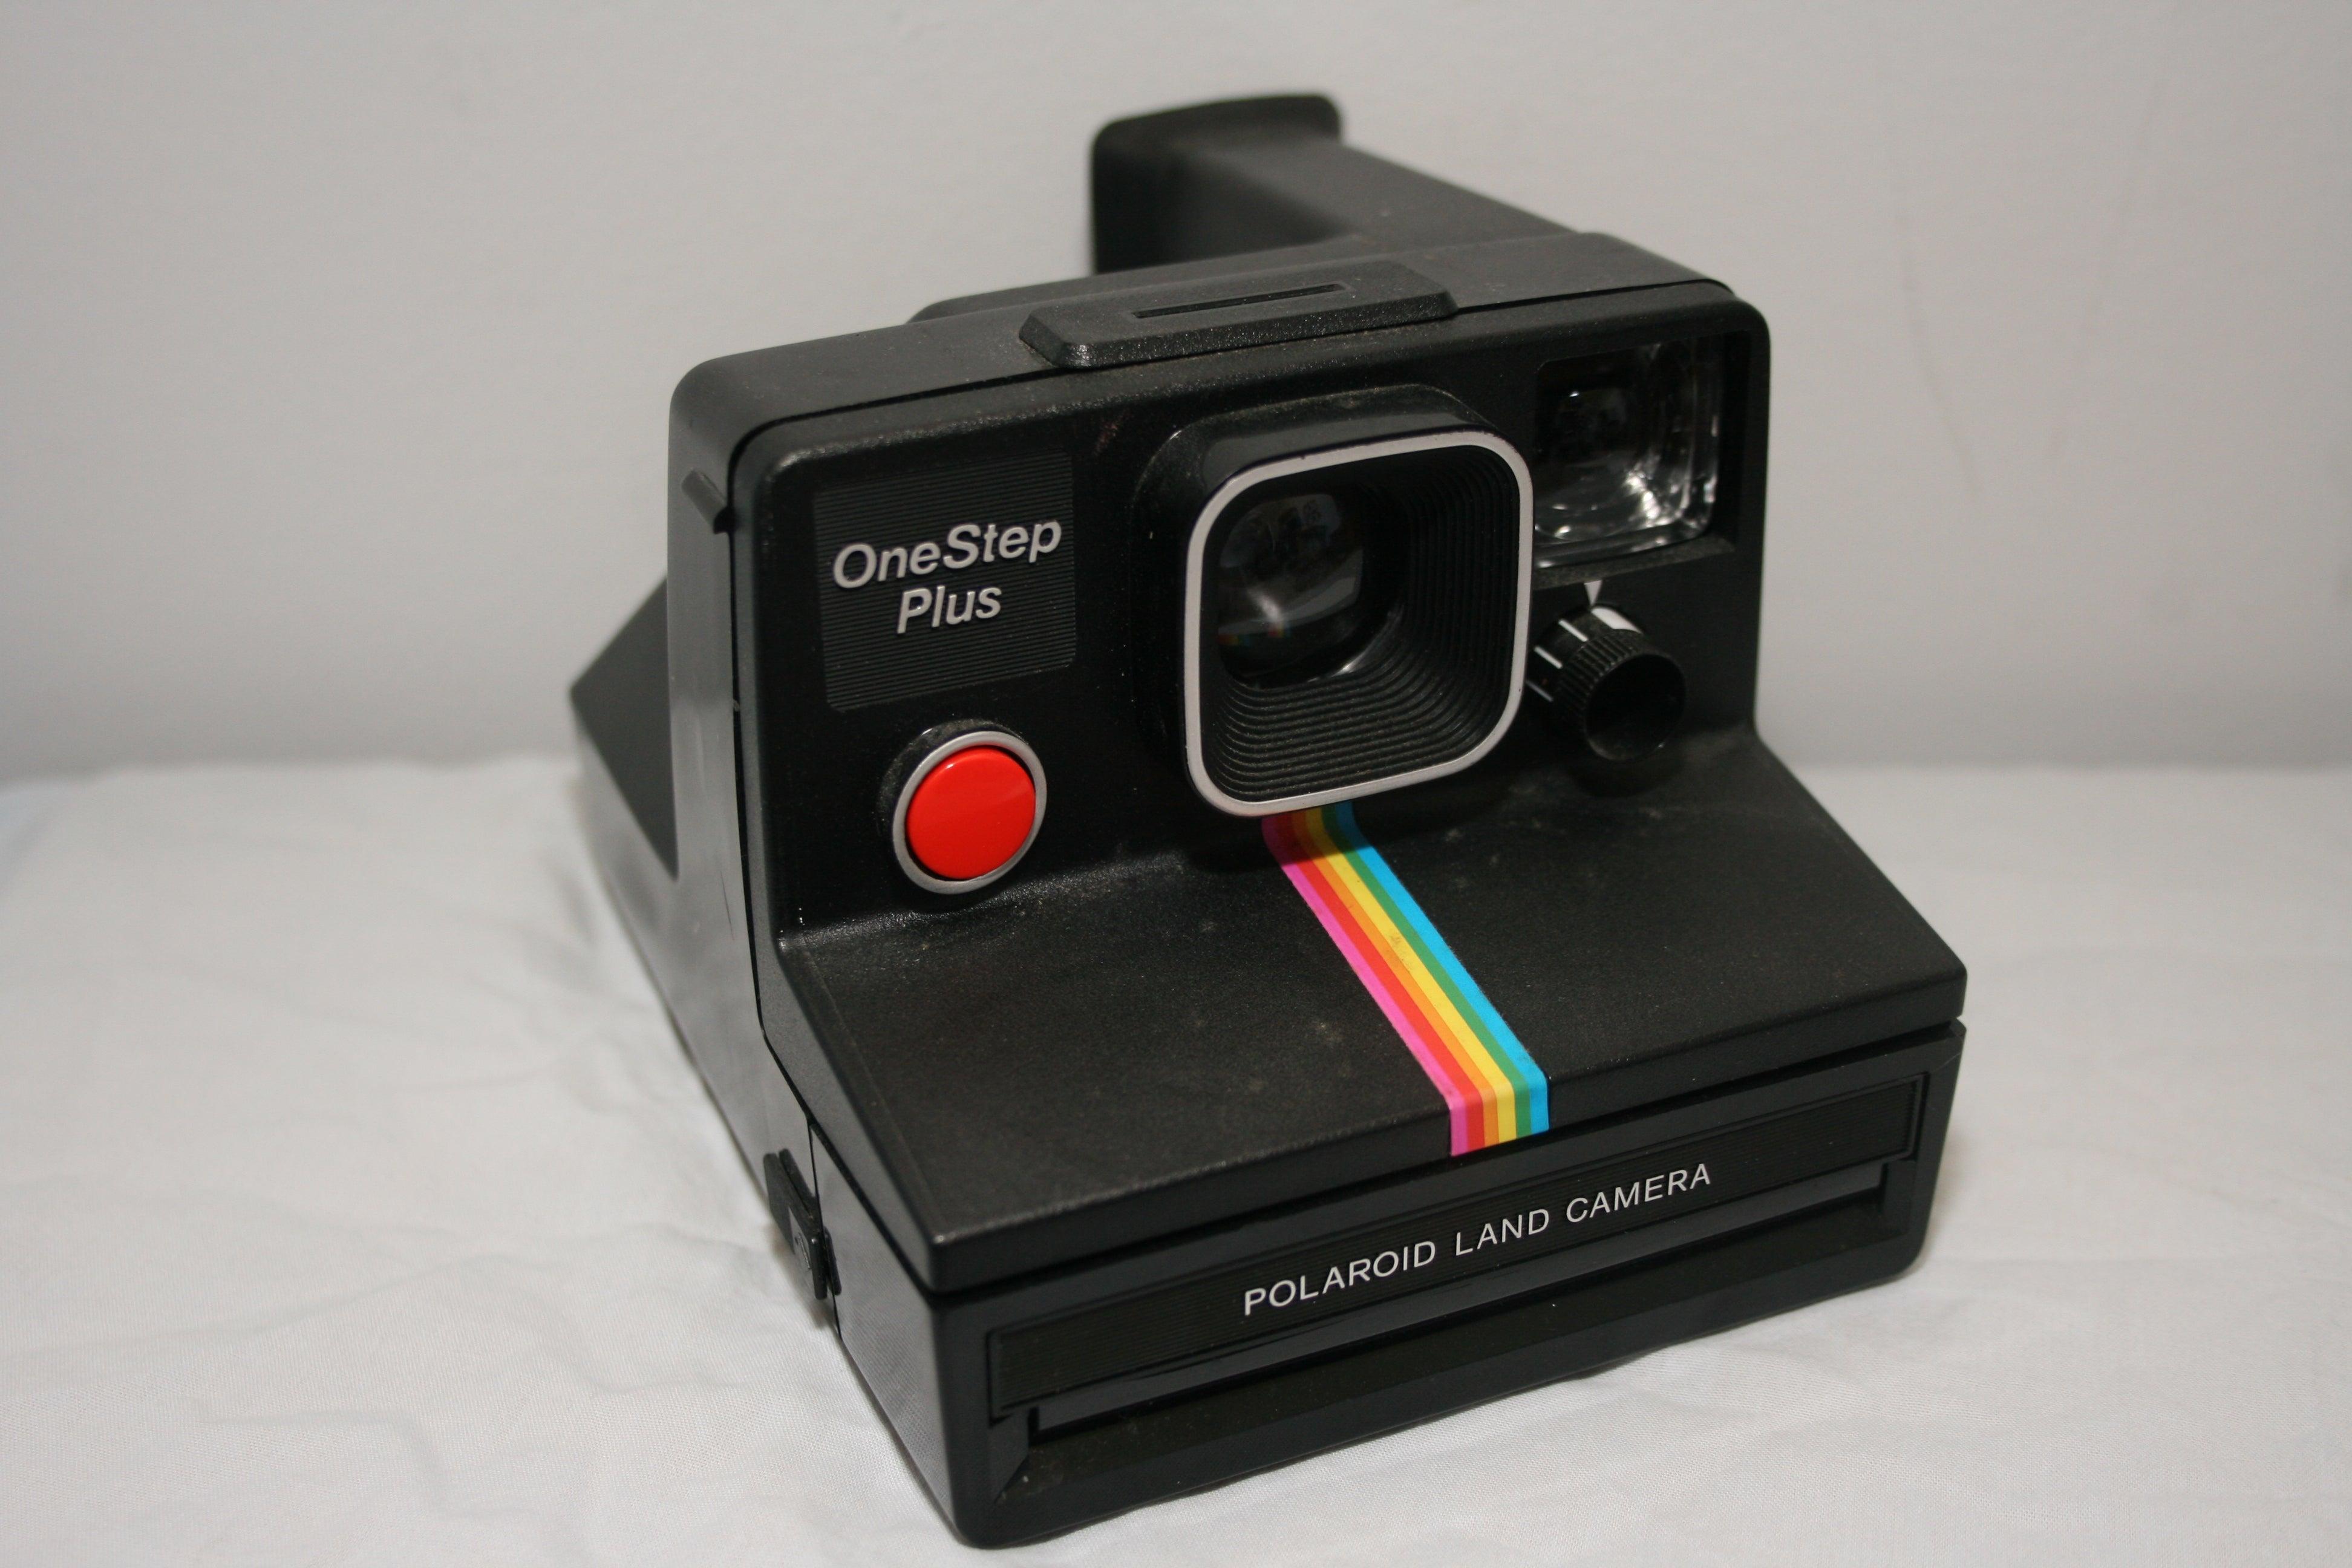 Polaroid Camera Urban Outfitters Uk : Polaroid onestep instant camera the gizmodo review gizmodo